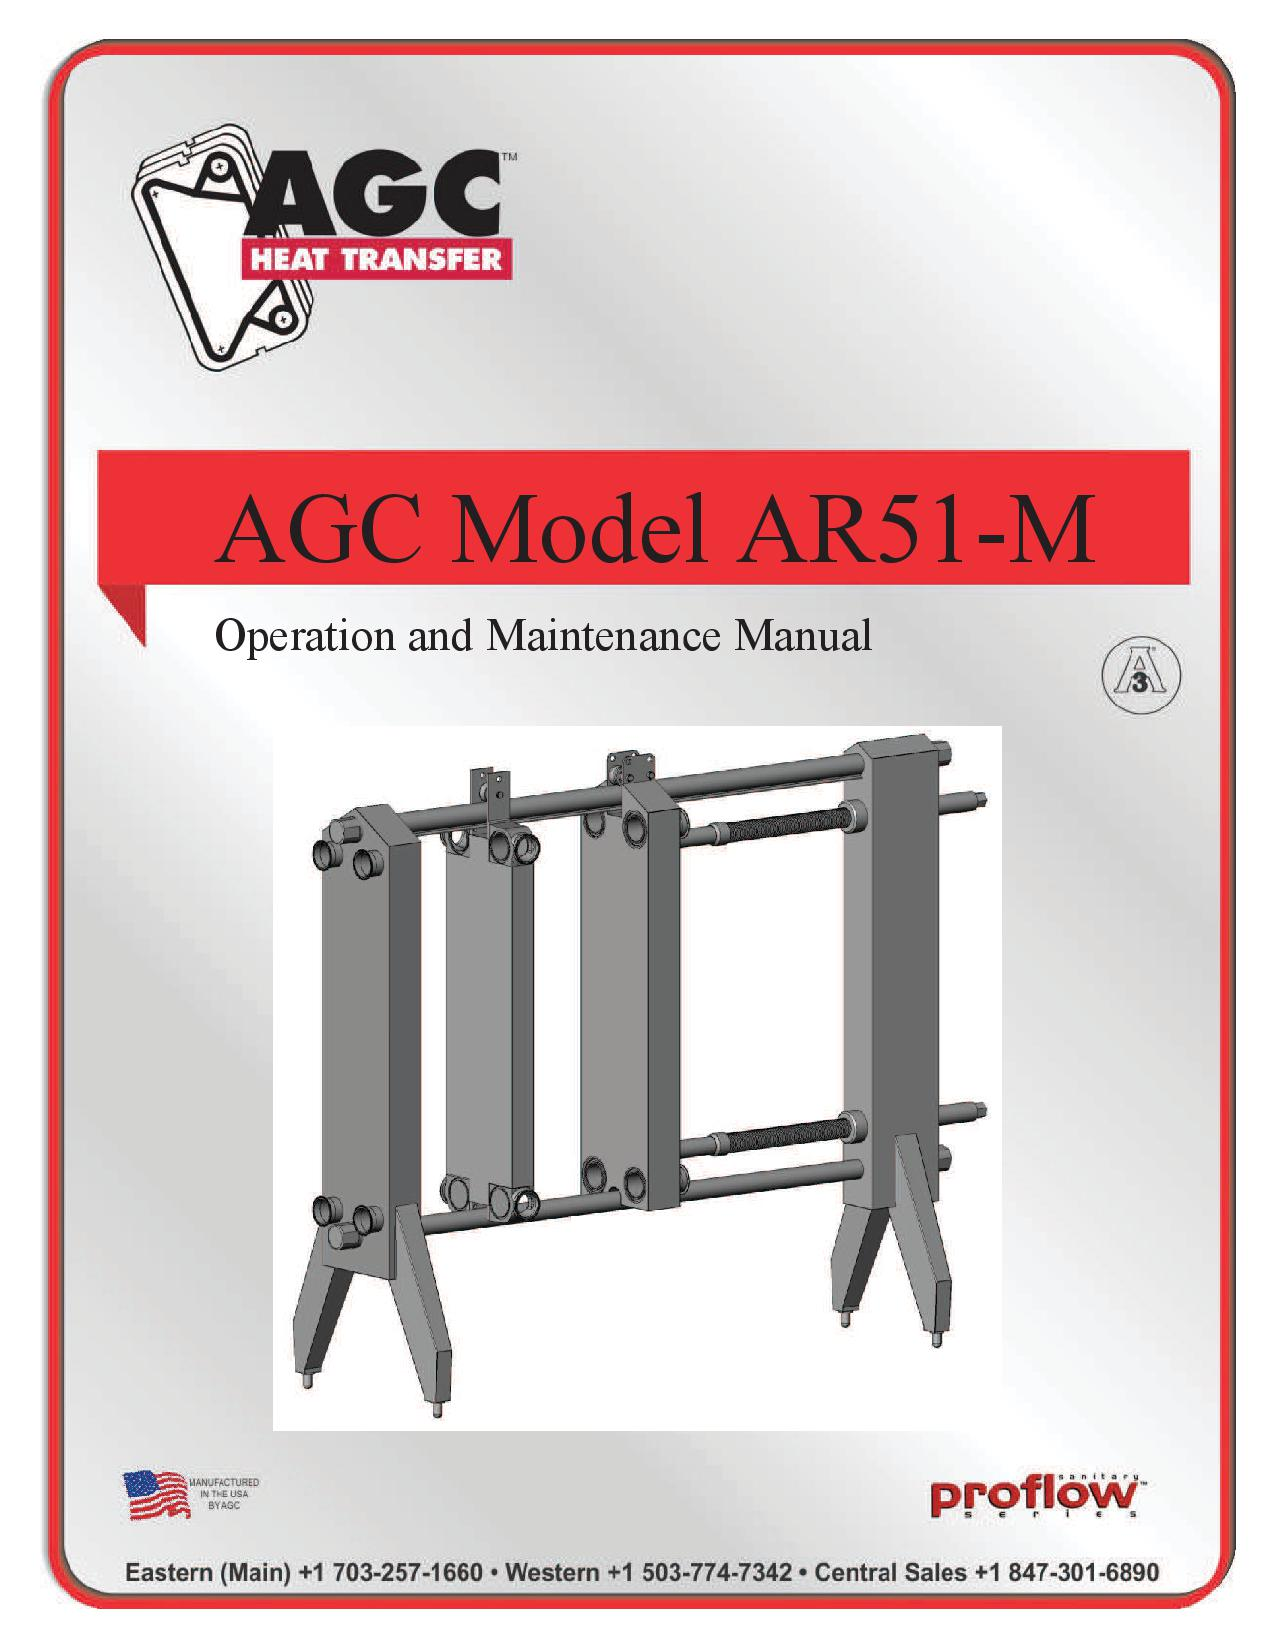 AGC Operating Manual AR51-M